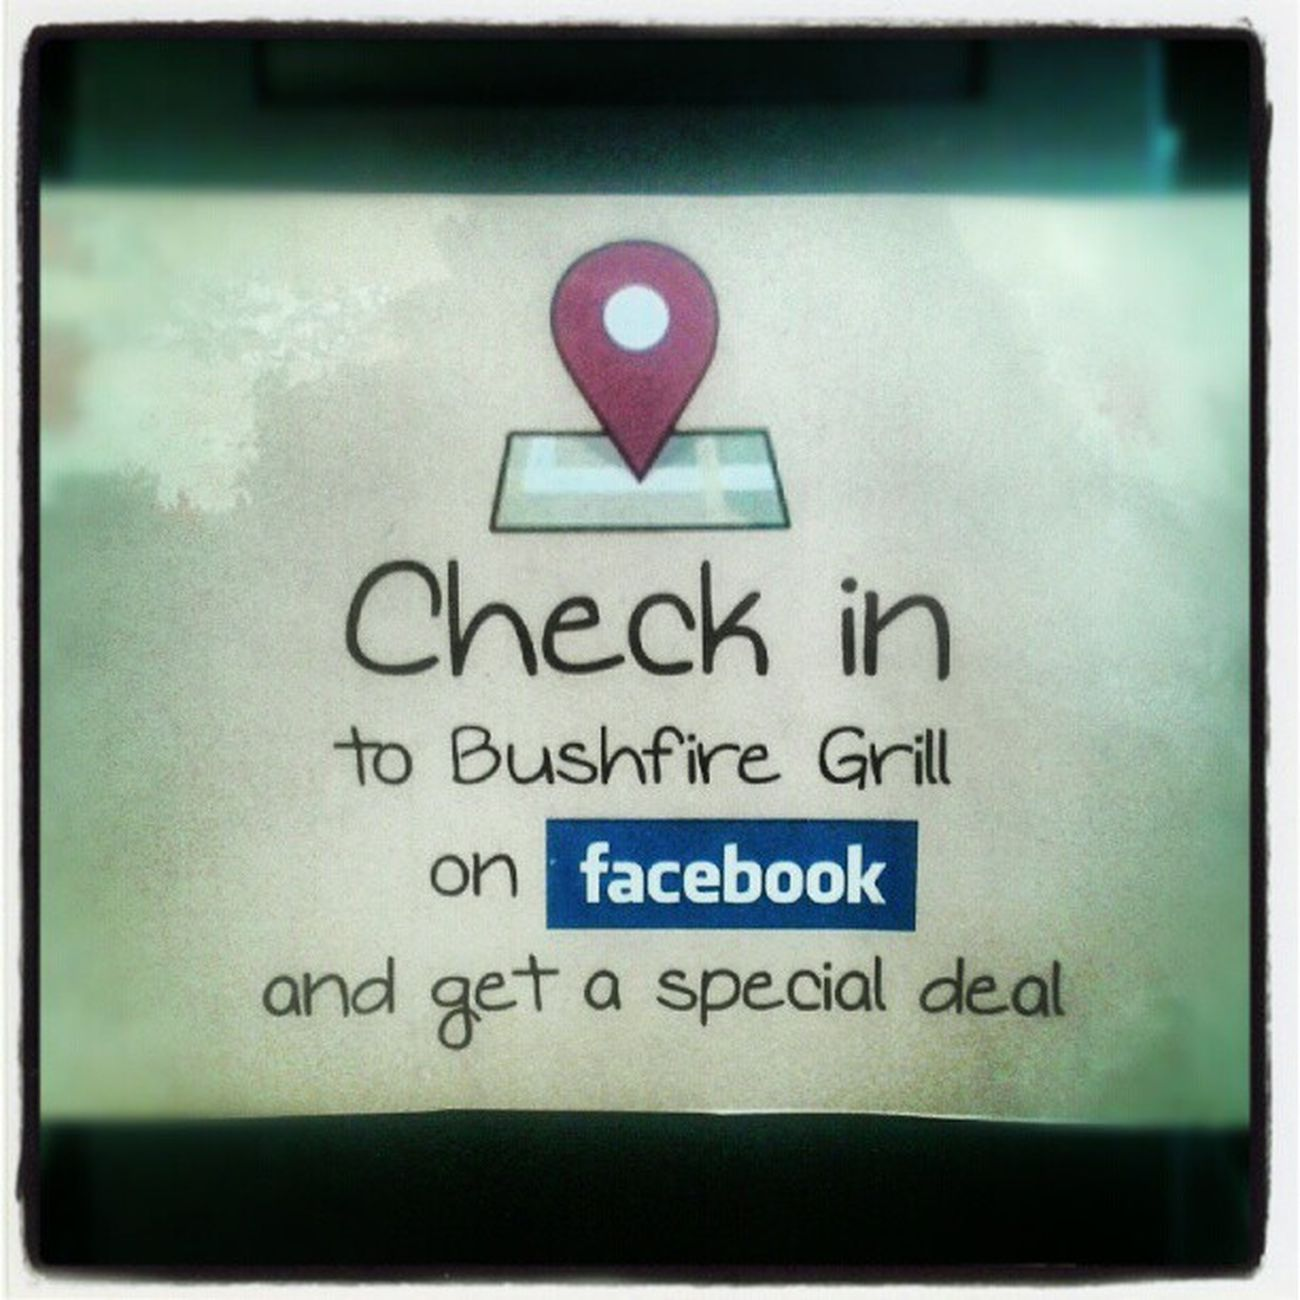 Bushfiregrill Facebook Discount